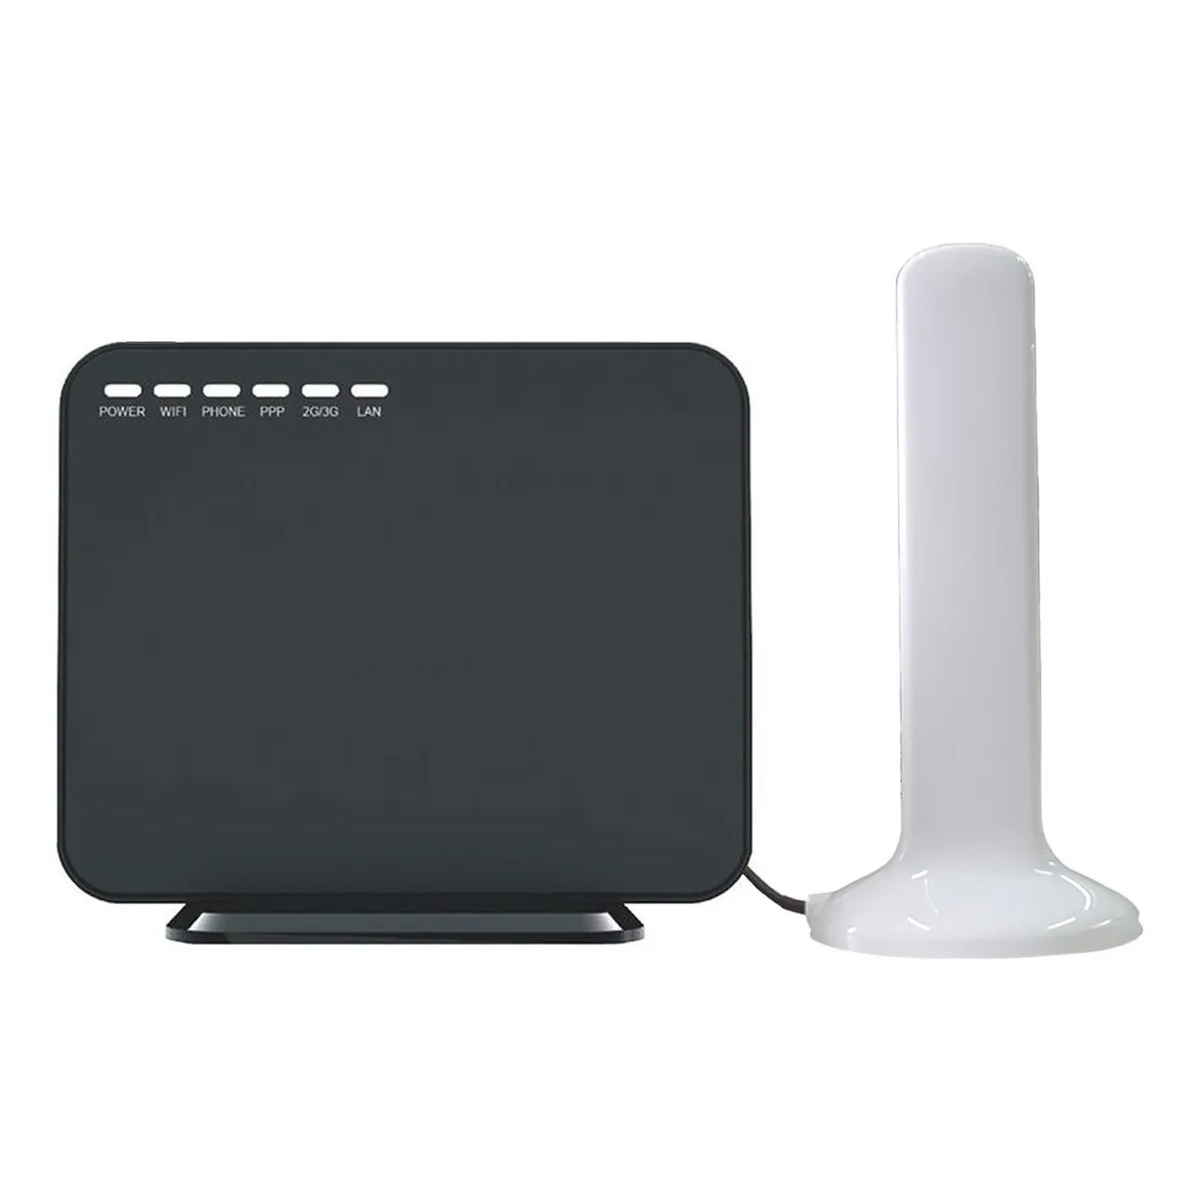 Roteador Wi-fi Rural 2g/3g Zte Mf25b Desbloqueado Outlet